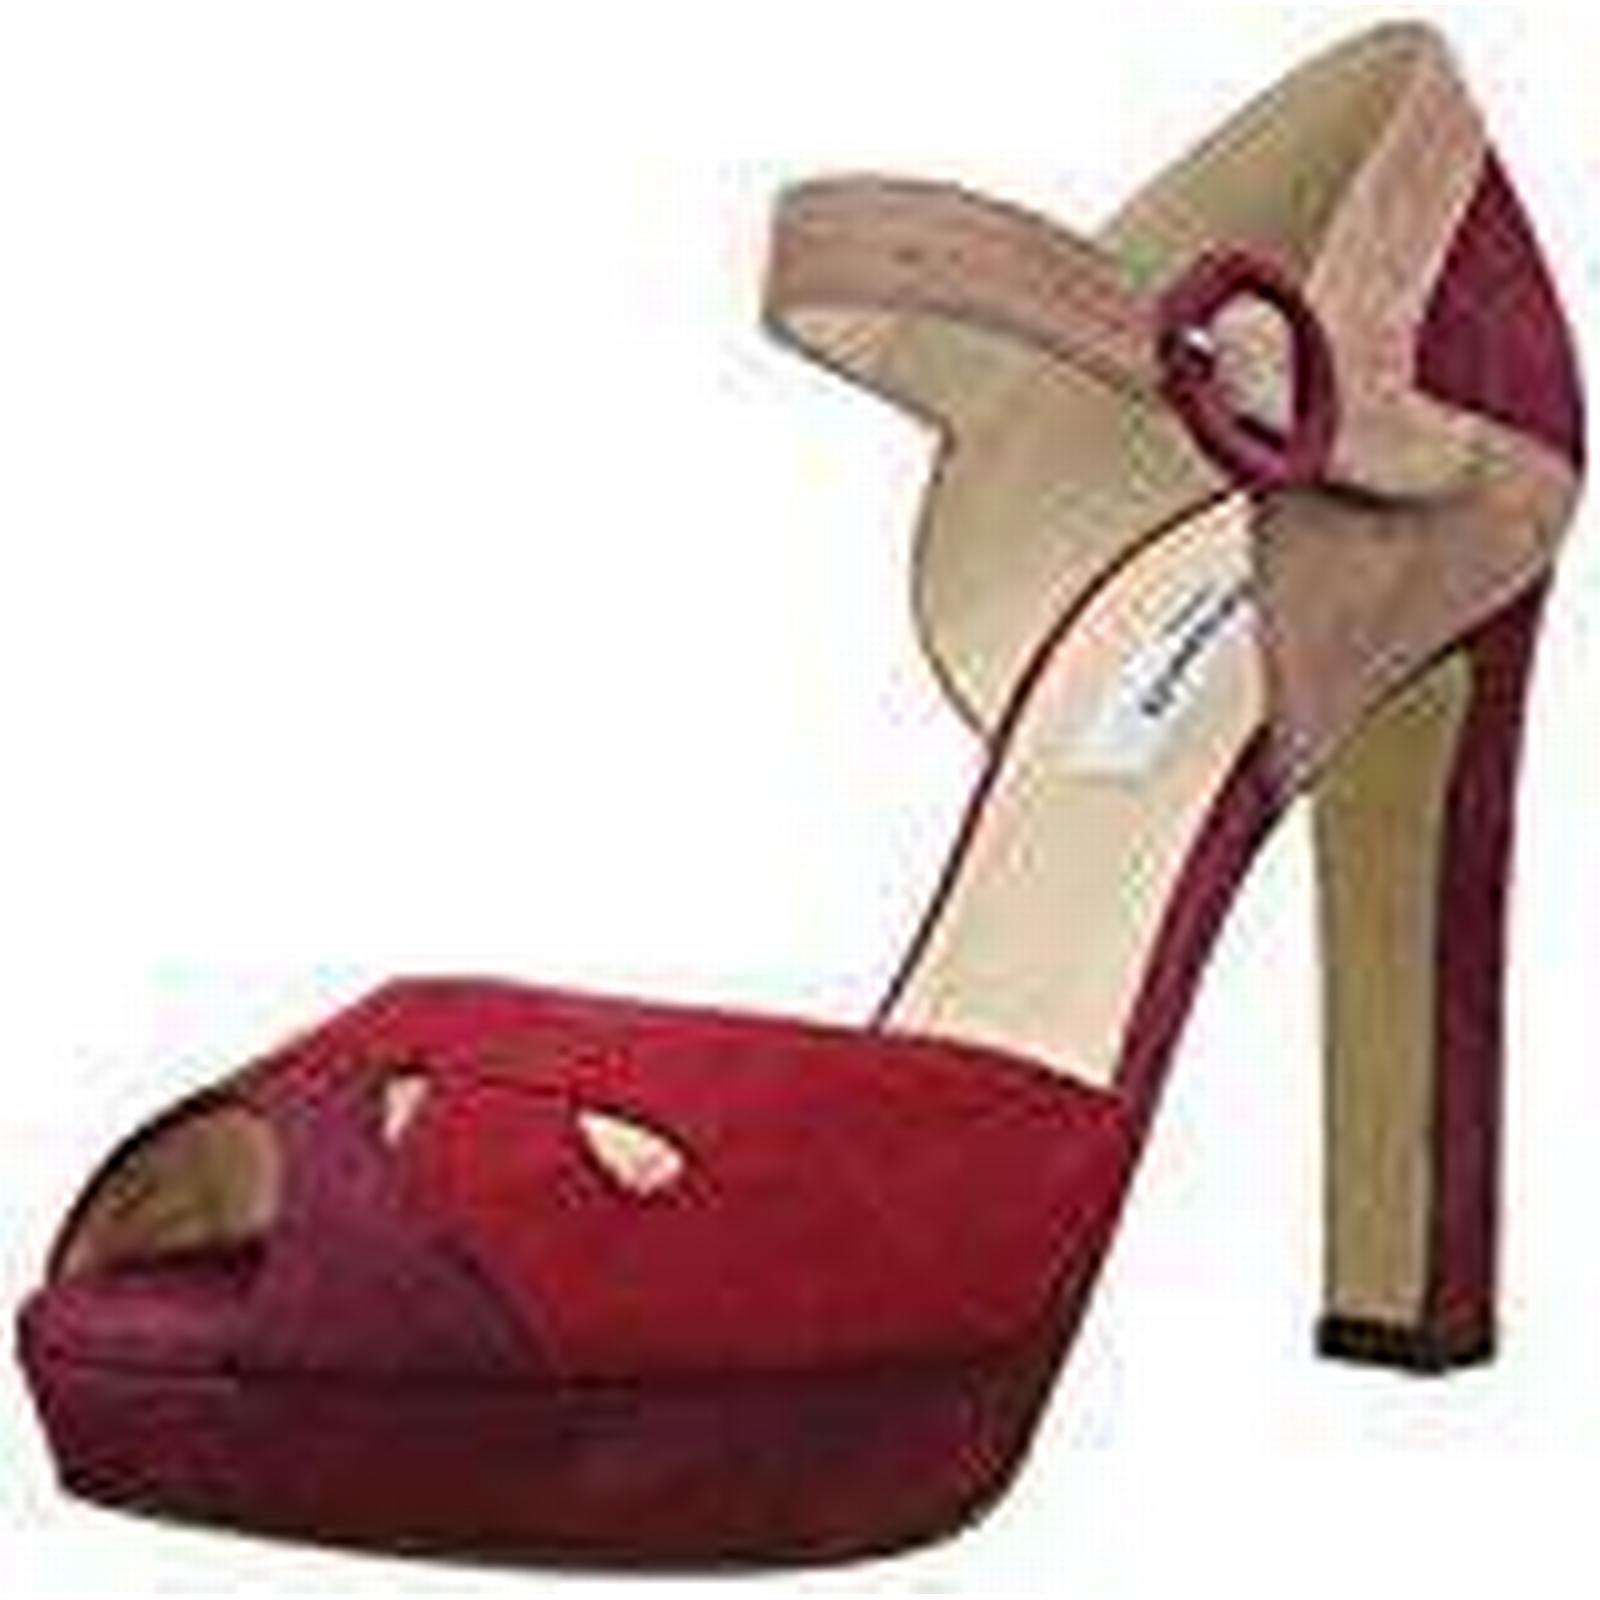 LK BENNETT L.K. Bennett Eli, Multicolor Women's Wedge Heels Sandals, Multicolor Eli, (Roca Red), 8 UK (41 EU) 0ce0e5